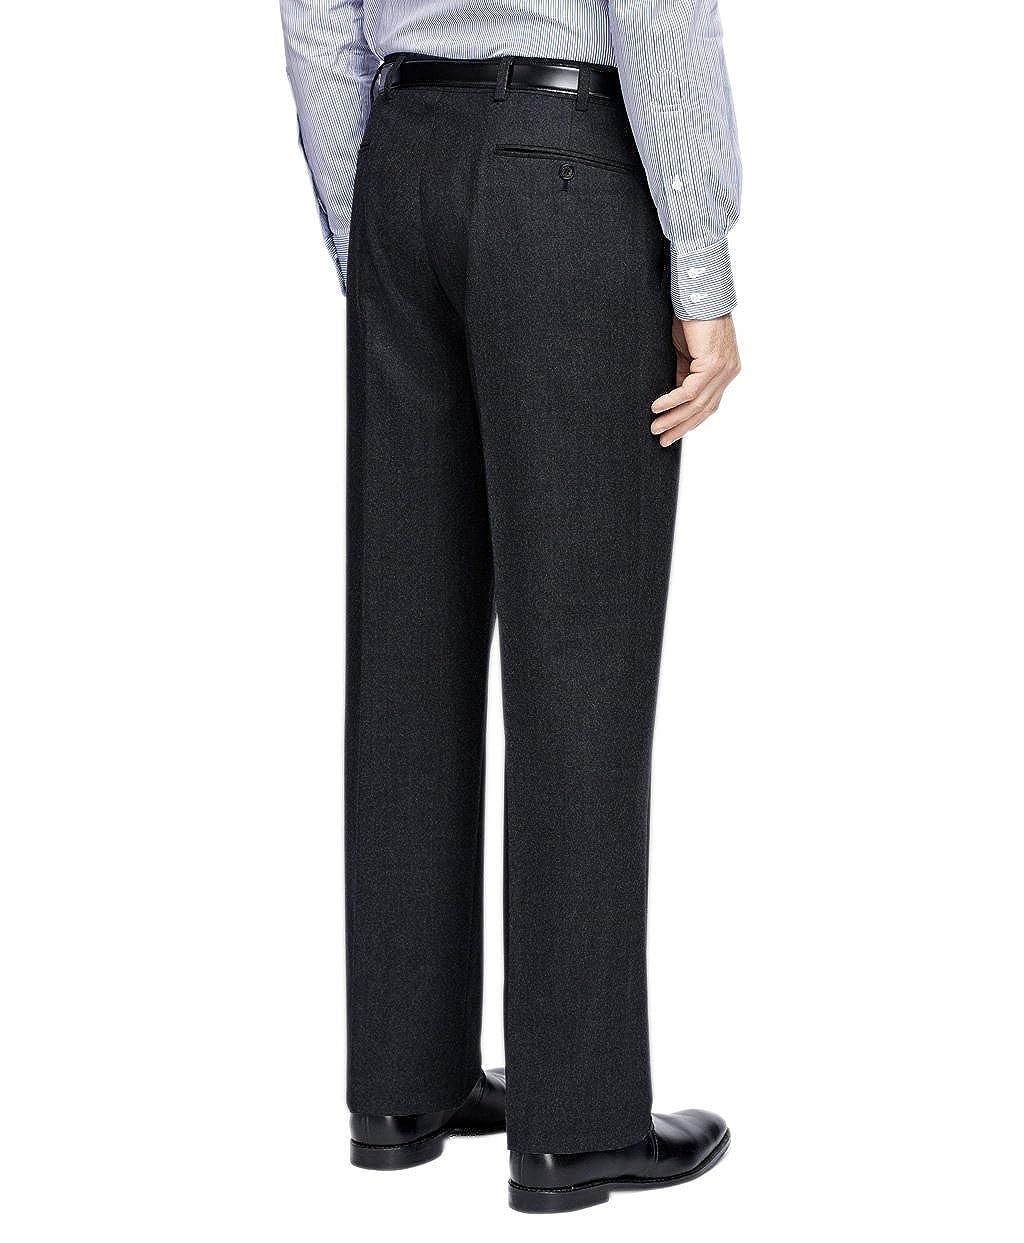 Brooks Brothers Mens Madison Fit Flat Front 100/% Wool Dress Pants Dark Charcoal Grey